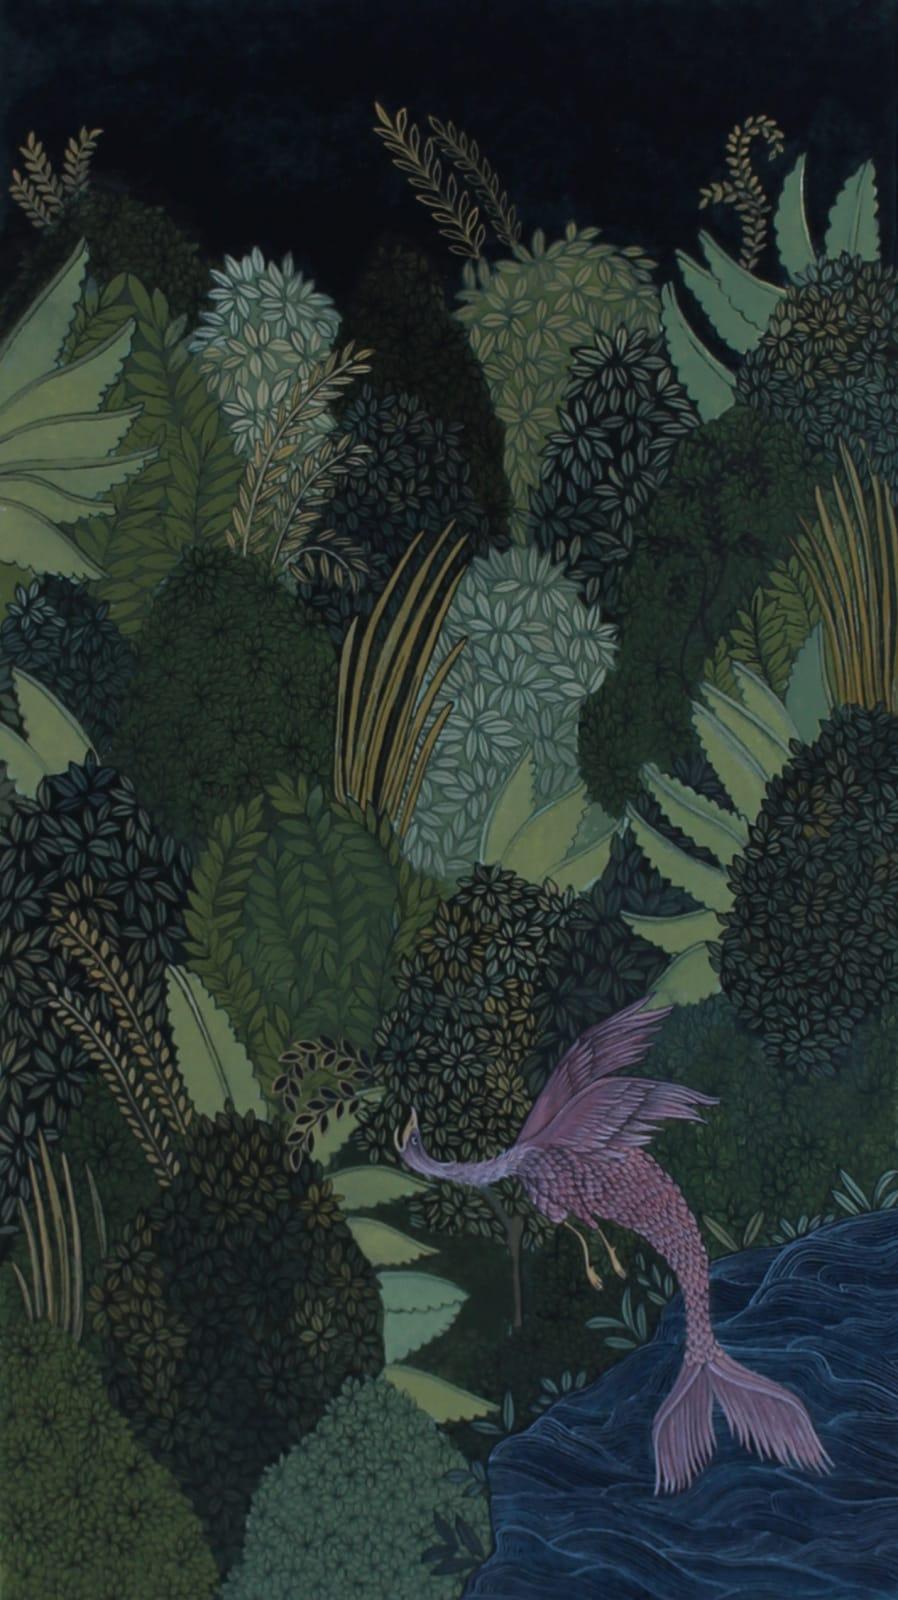 Maha Ahmed, Under the Night's Sky, 2019 Gouache on paper 19.2 x 10.5 cm